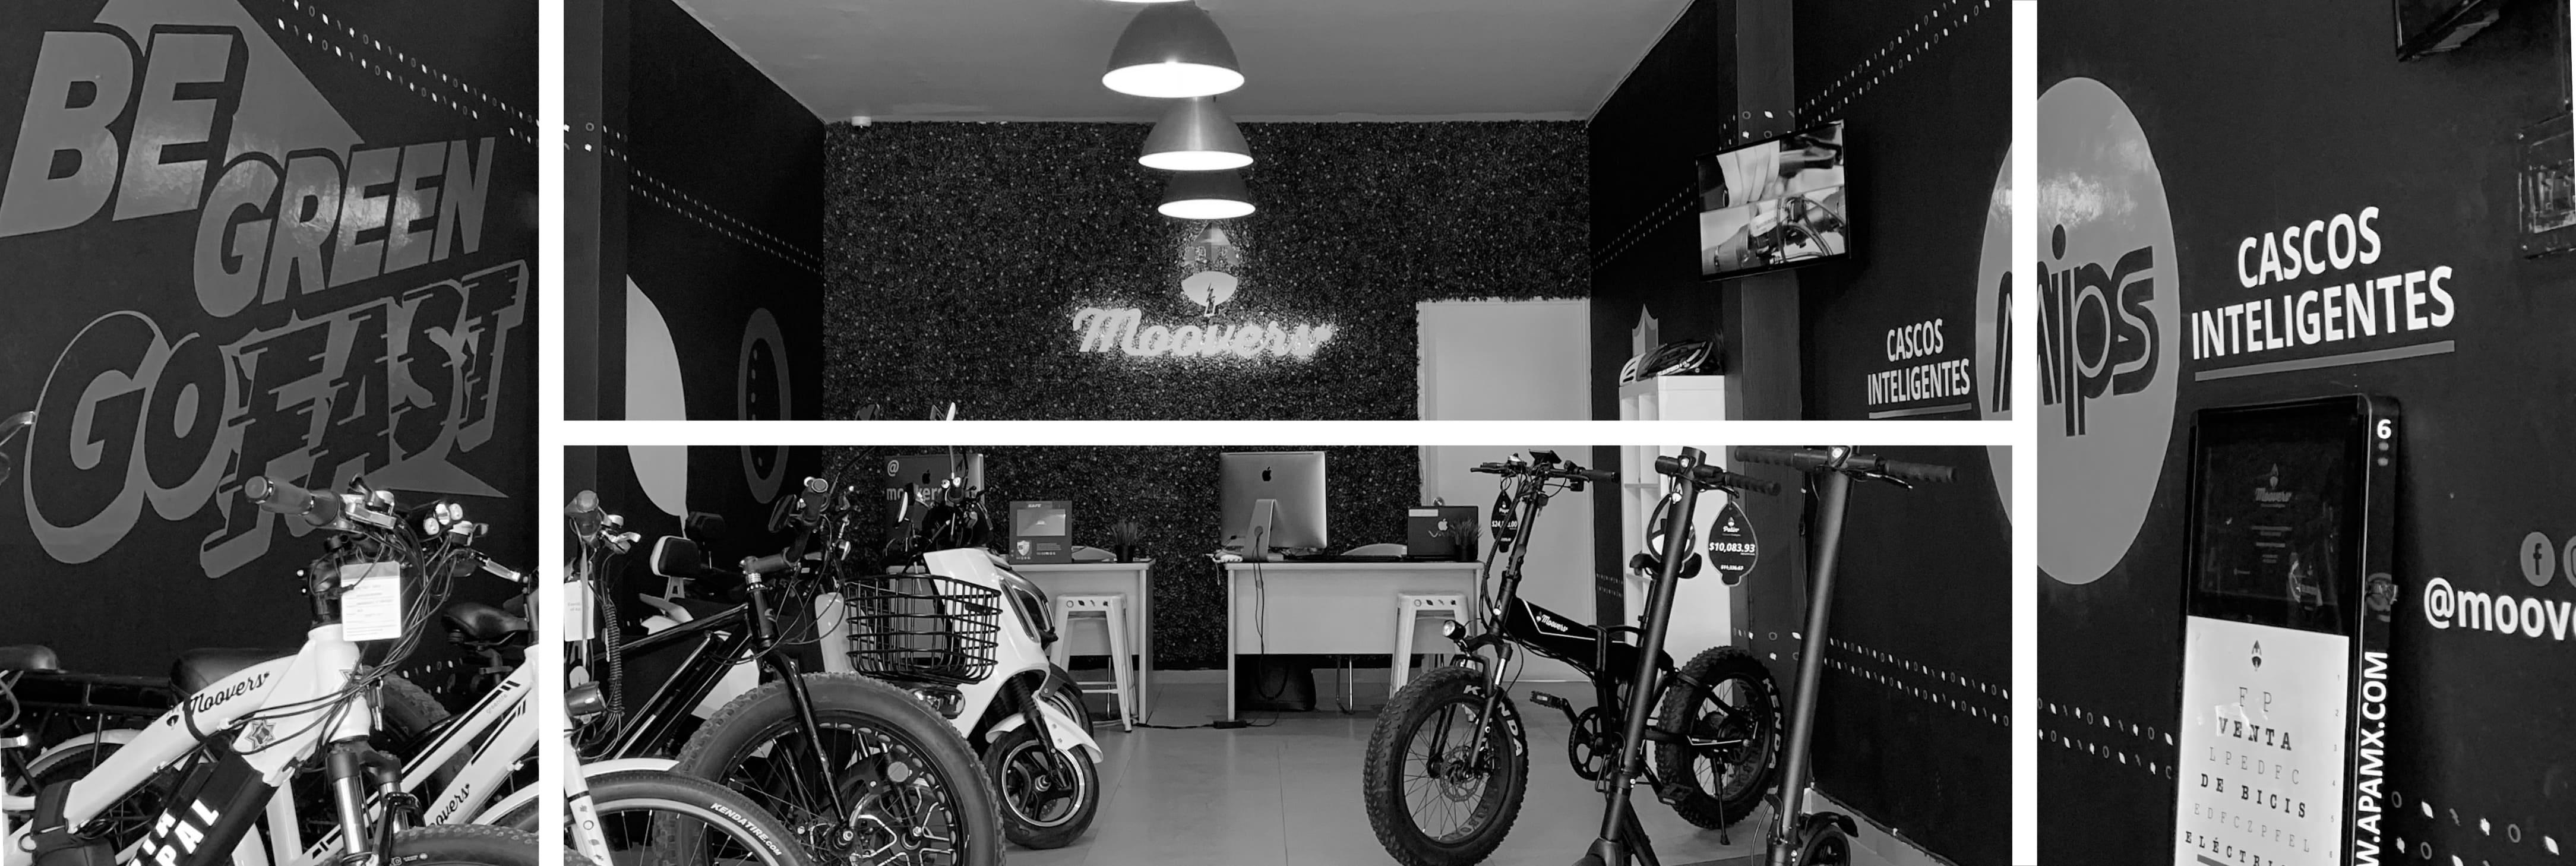 Venta scooters electricos en Tijuana